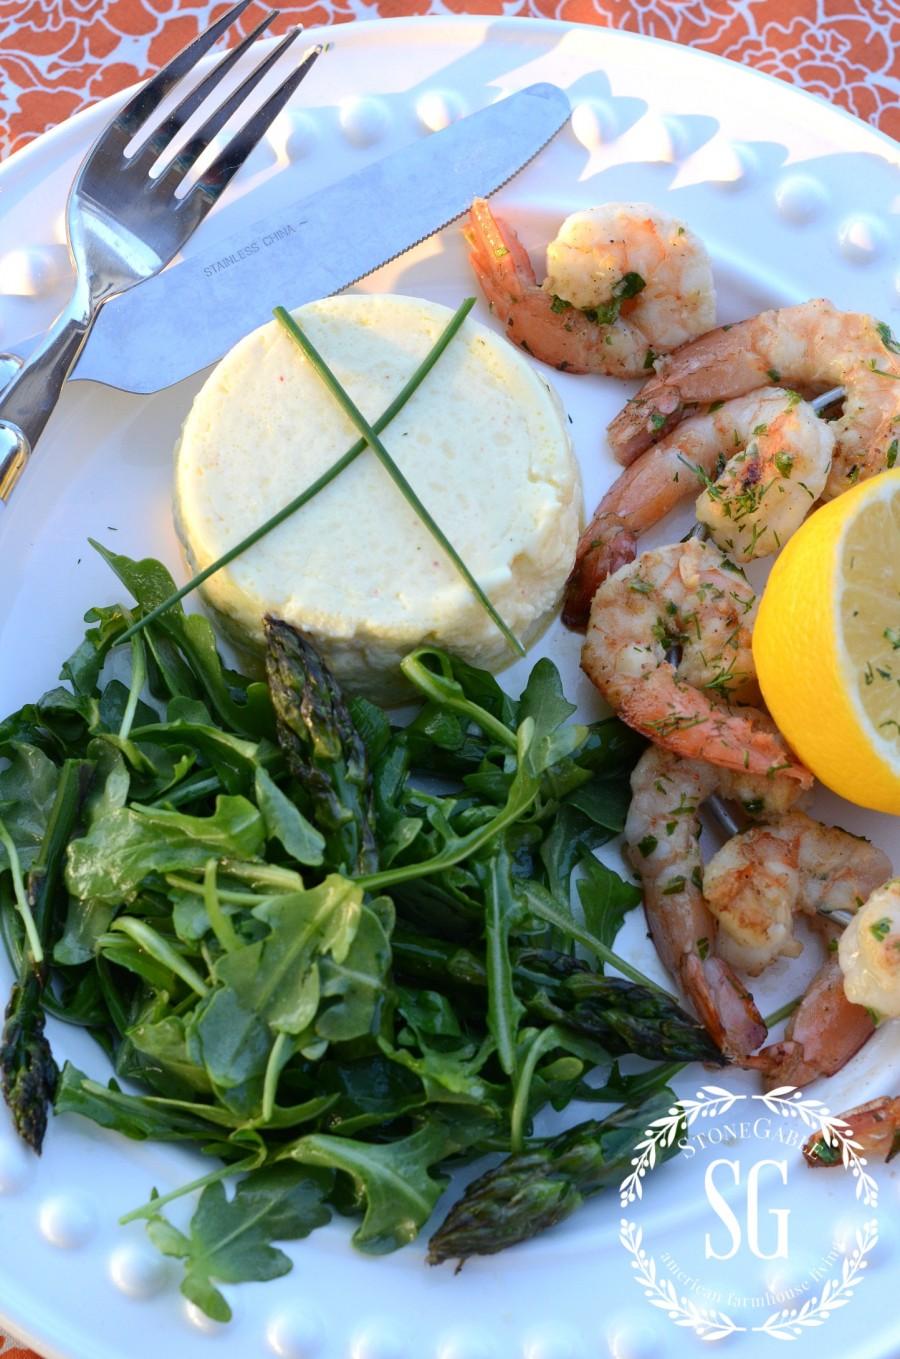 PARMESAN FLAN-a light scrumptious dinner-stonegableblog.com